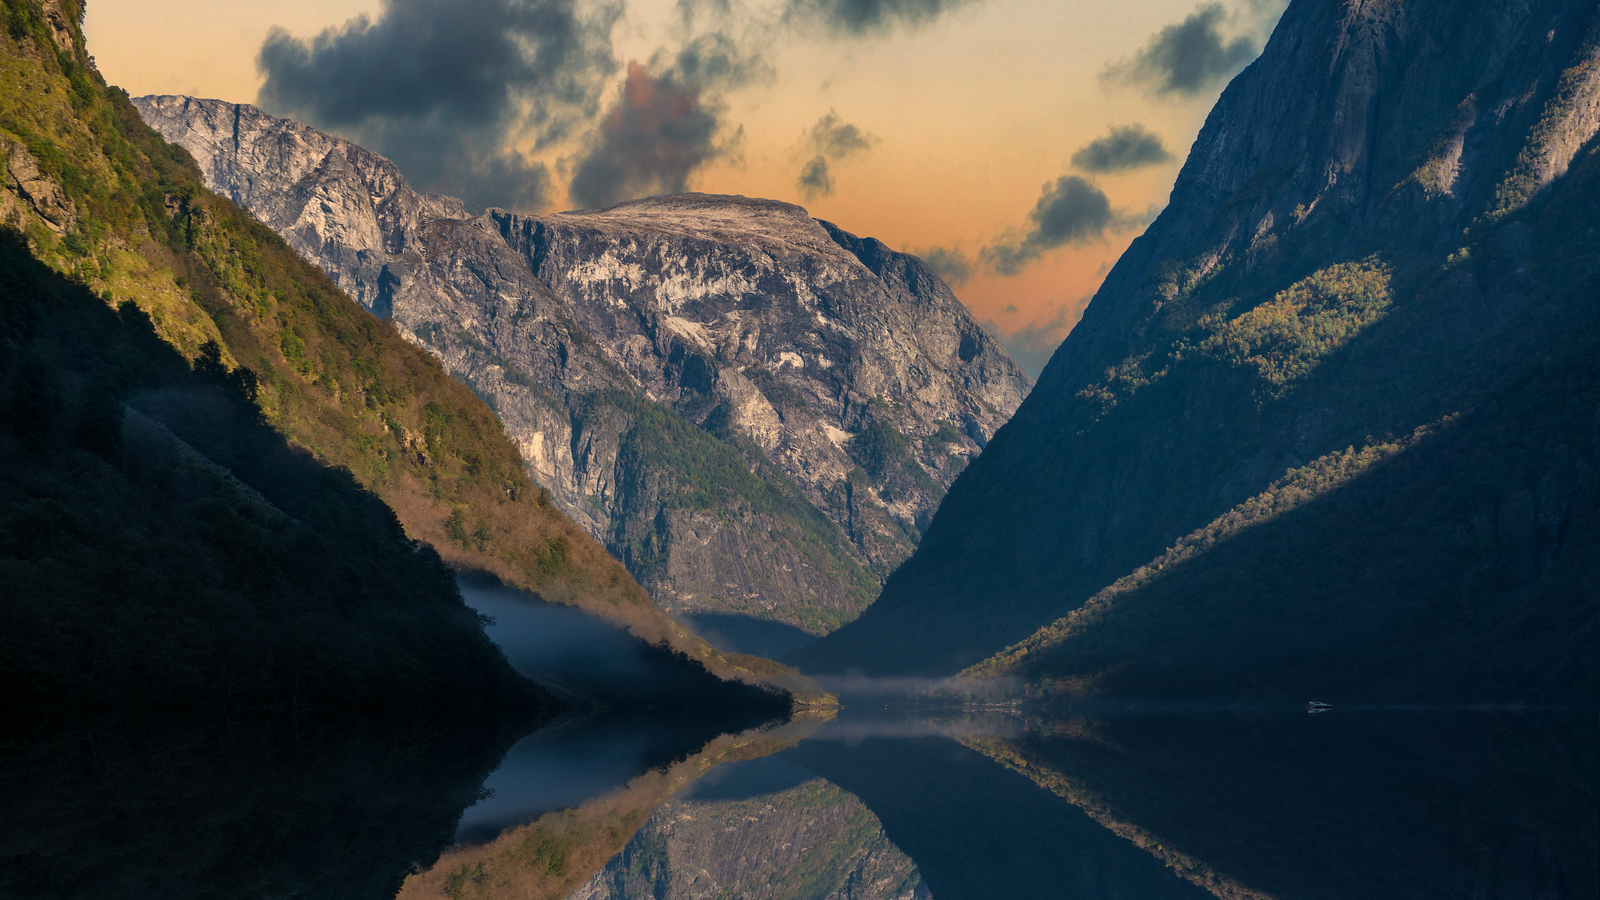 Heading into the Norwegian Fjords